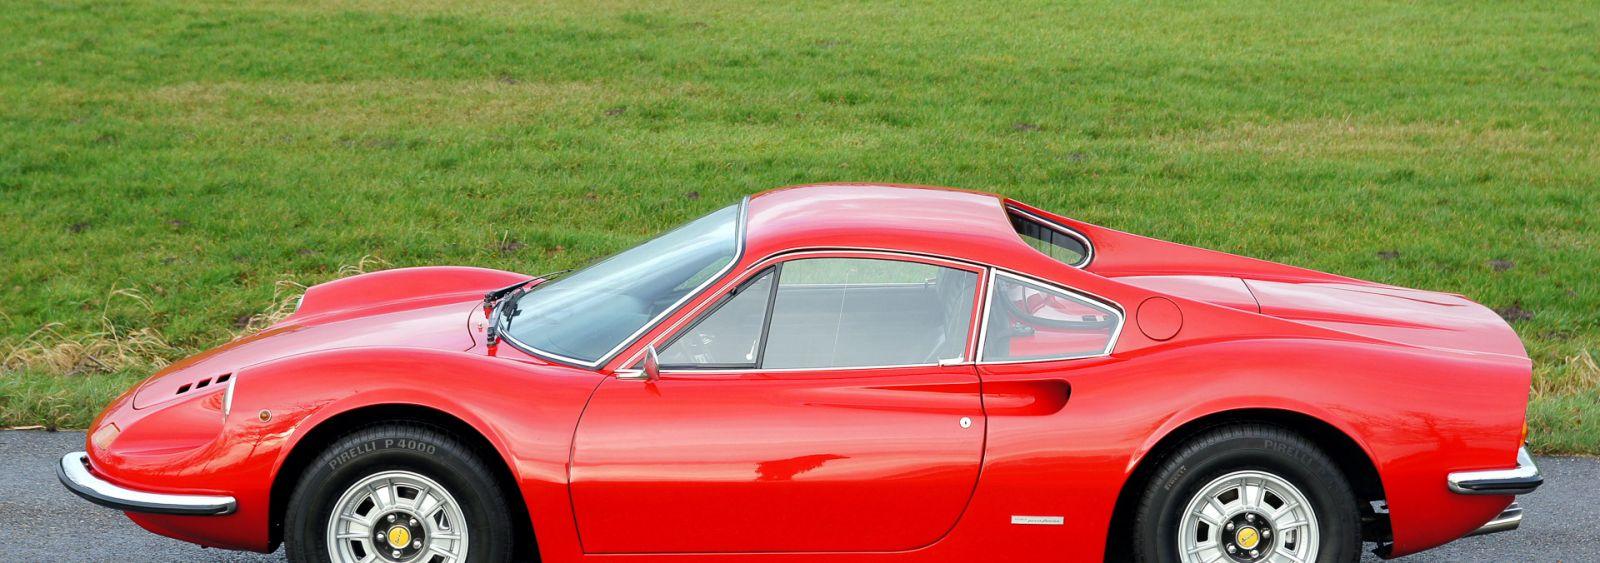 Ferrari Dino 246 Gt 1972 Classicargarage De